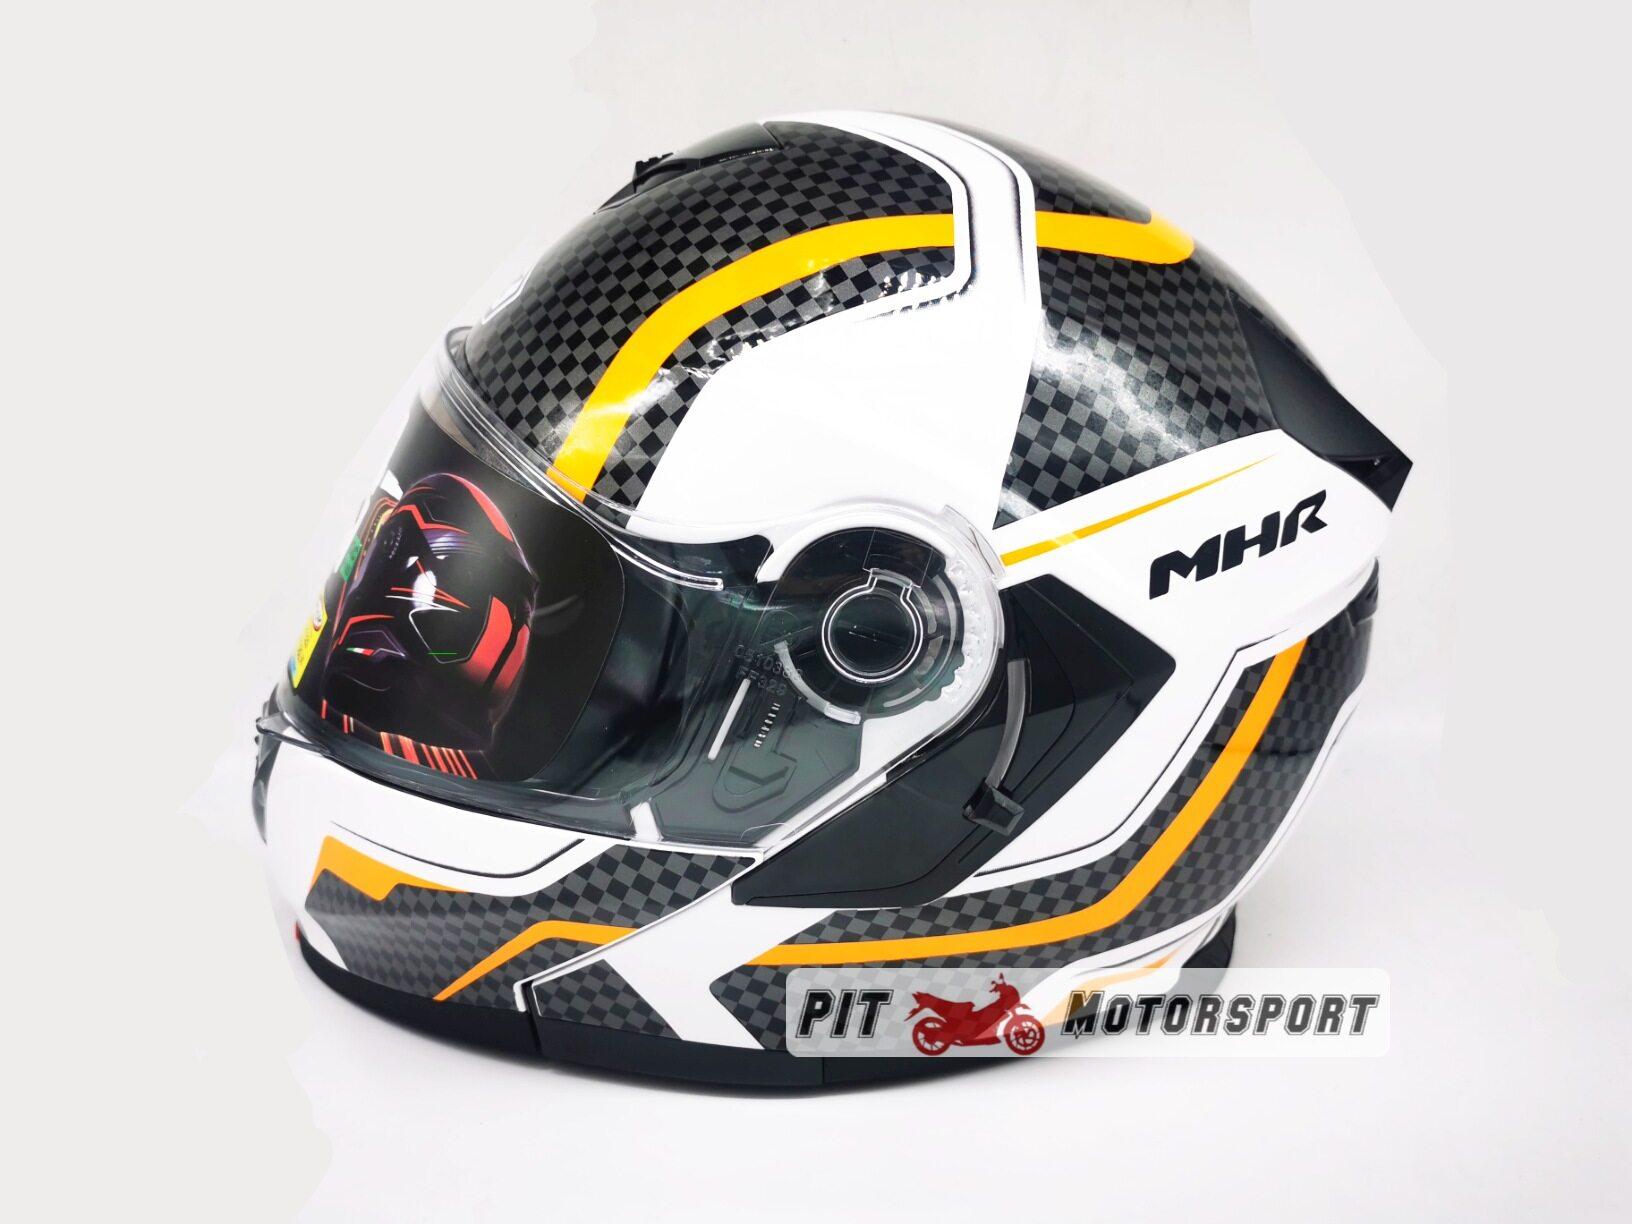 MHR Full Face Flip Up Double Visor Helmet New Design FF329 GT4 GP RACING Orange Protect Protection Helmet Motor Accessories